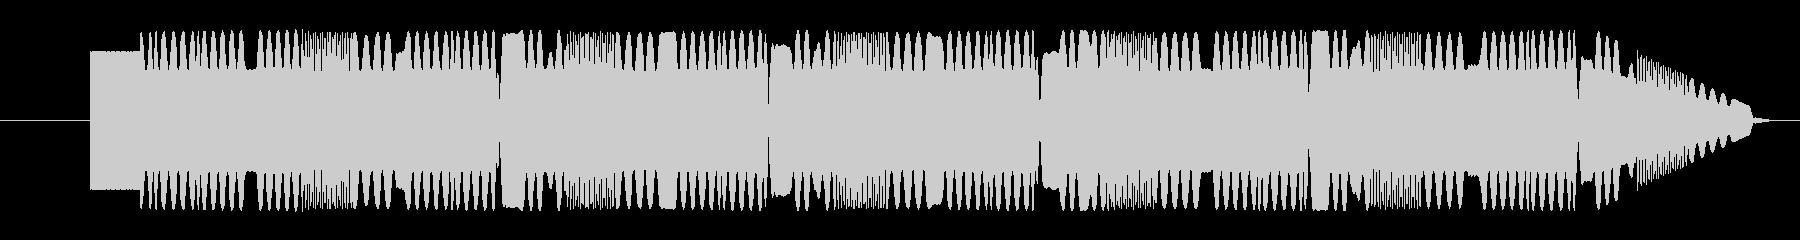 FX アーケードプレイング01の未再生の波形